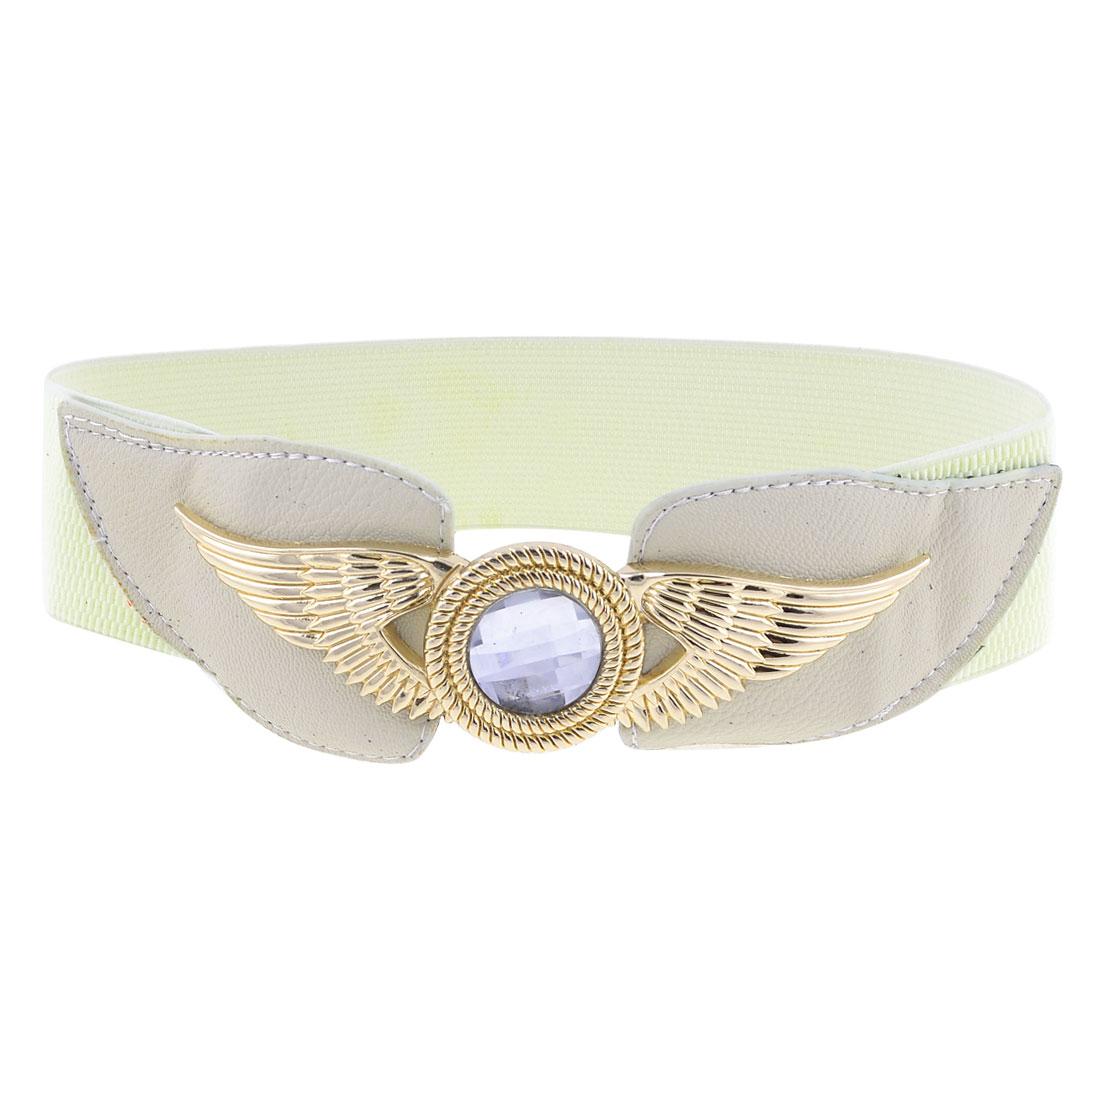 Eagle Crystal Metal Interlocking Buckle Elastic Off White Waist Belt for Ladies